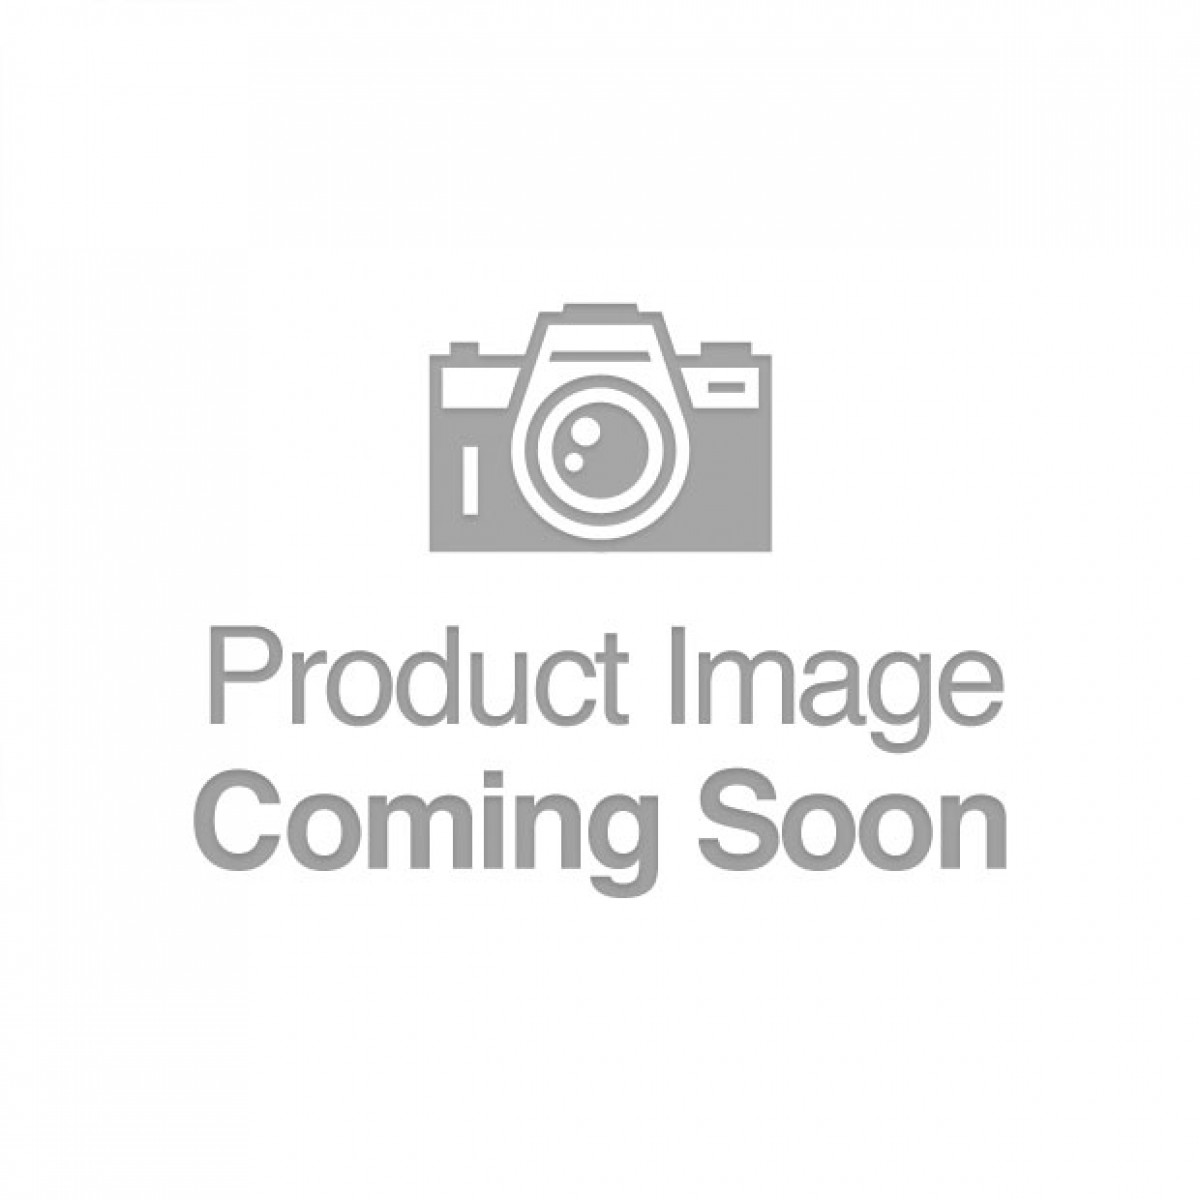 Dorcel Ultimate Expand Butt Plug w/Remote - Black